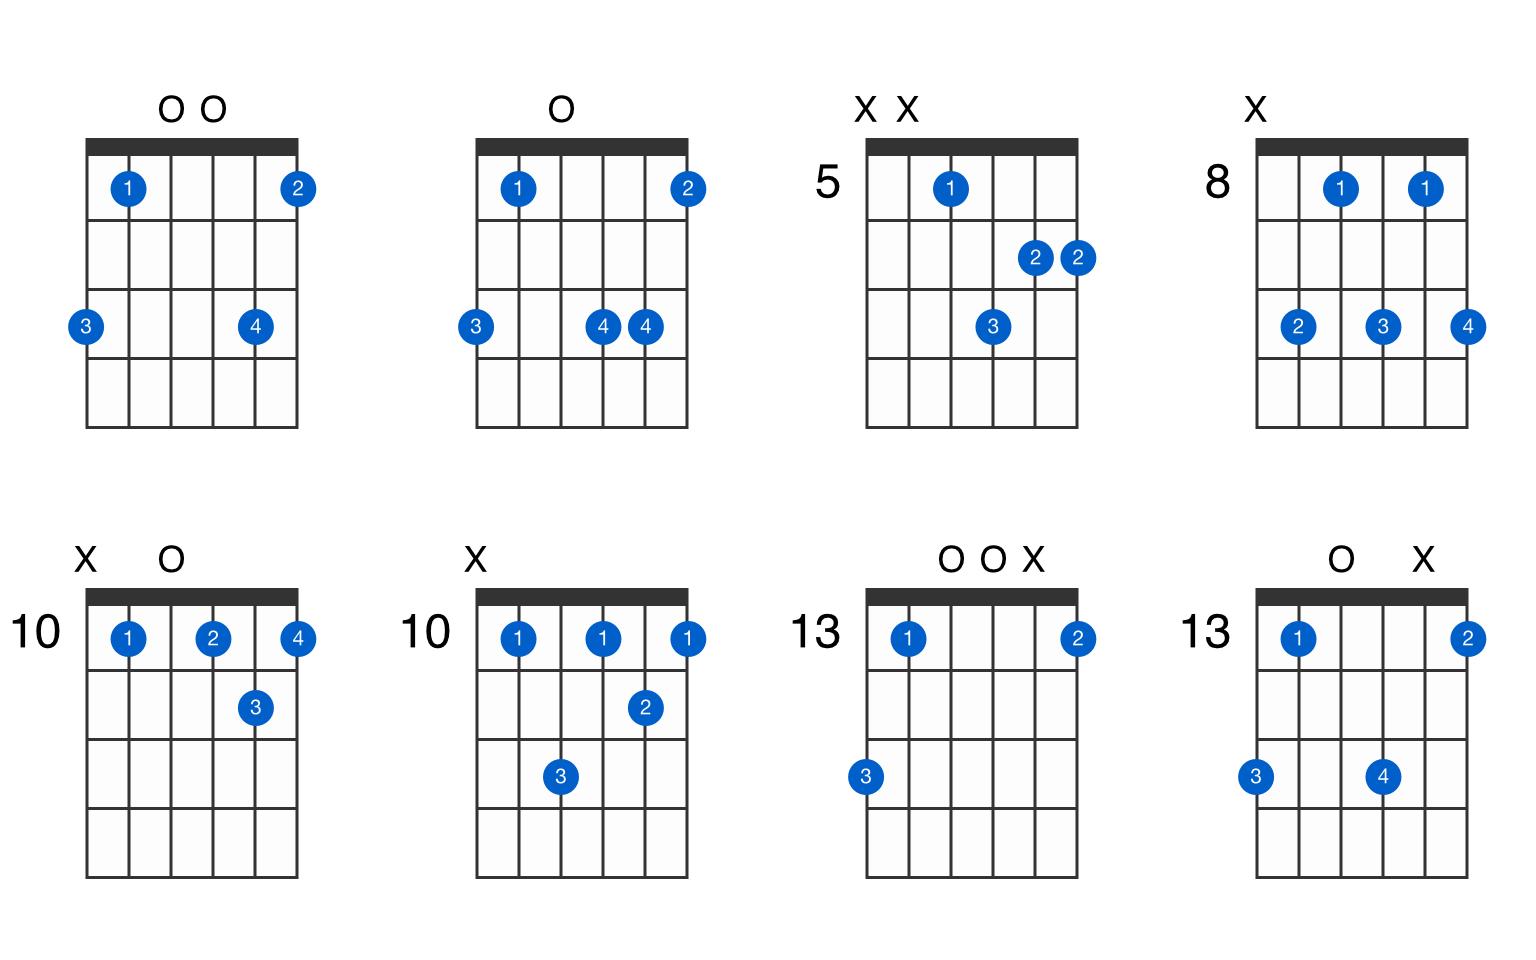 Gm15 guitar chord   GtrLib Chords